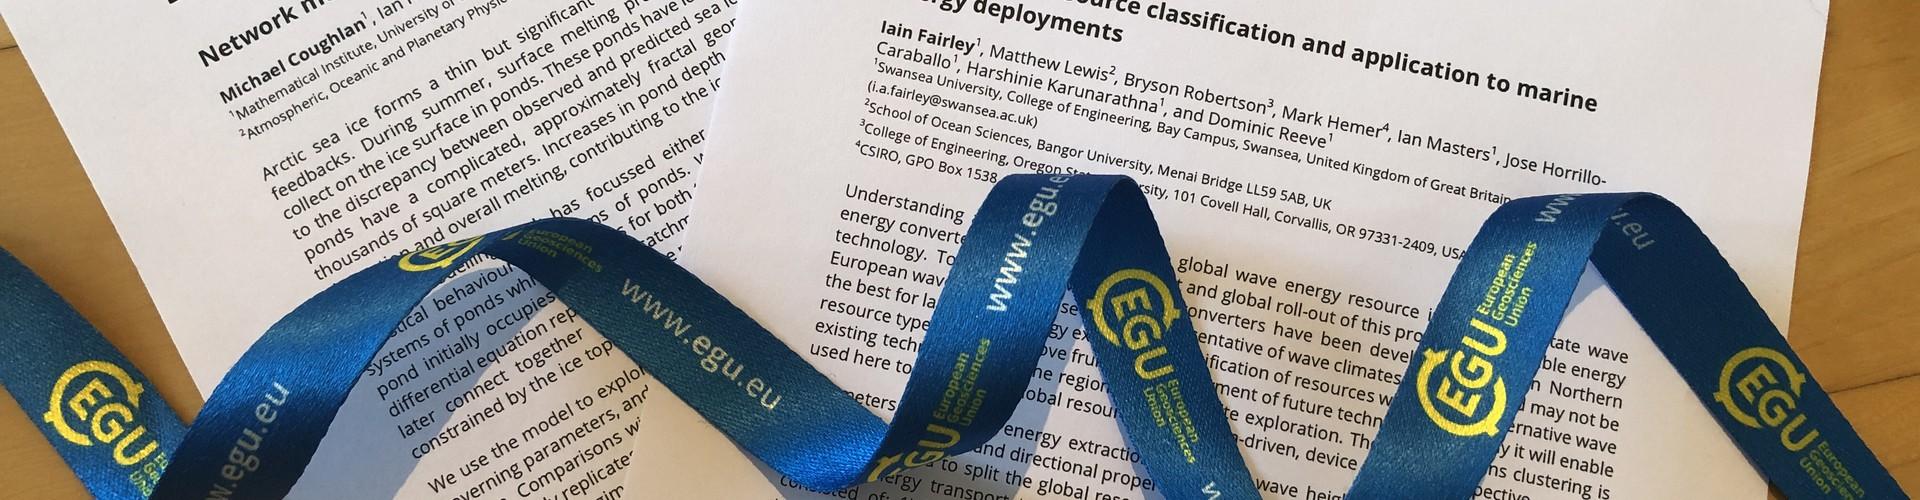 EGU papers publishing